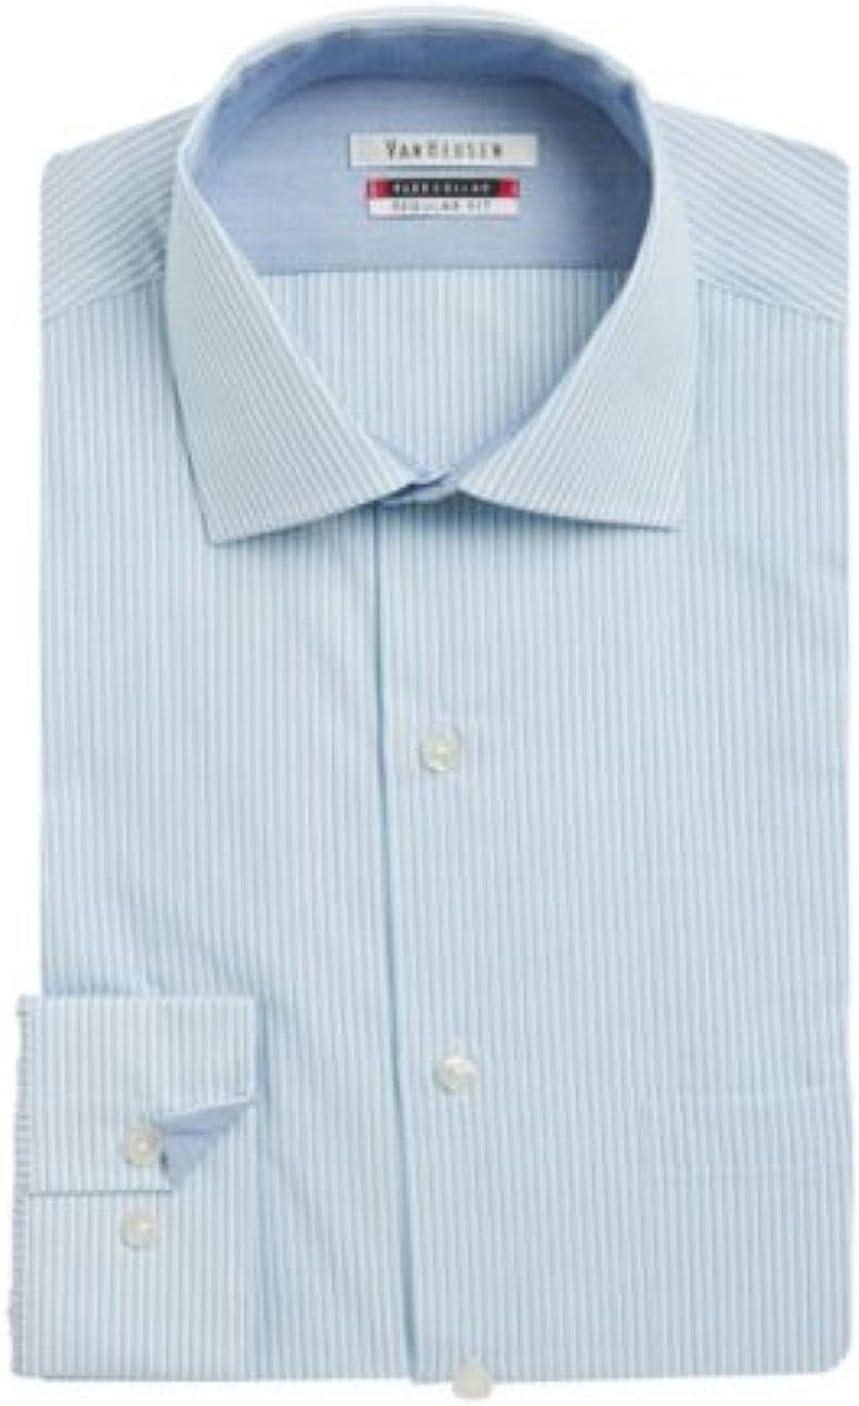 Van Heusen Men's Flex Collar Classic-Fit Plaid Dress Shirt (16